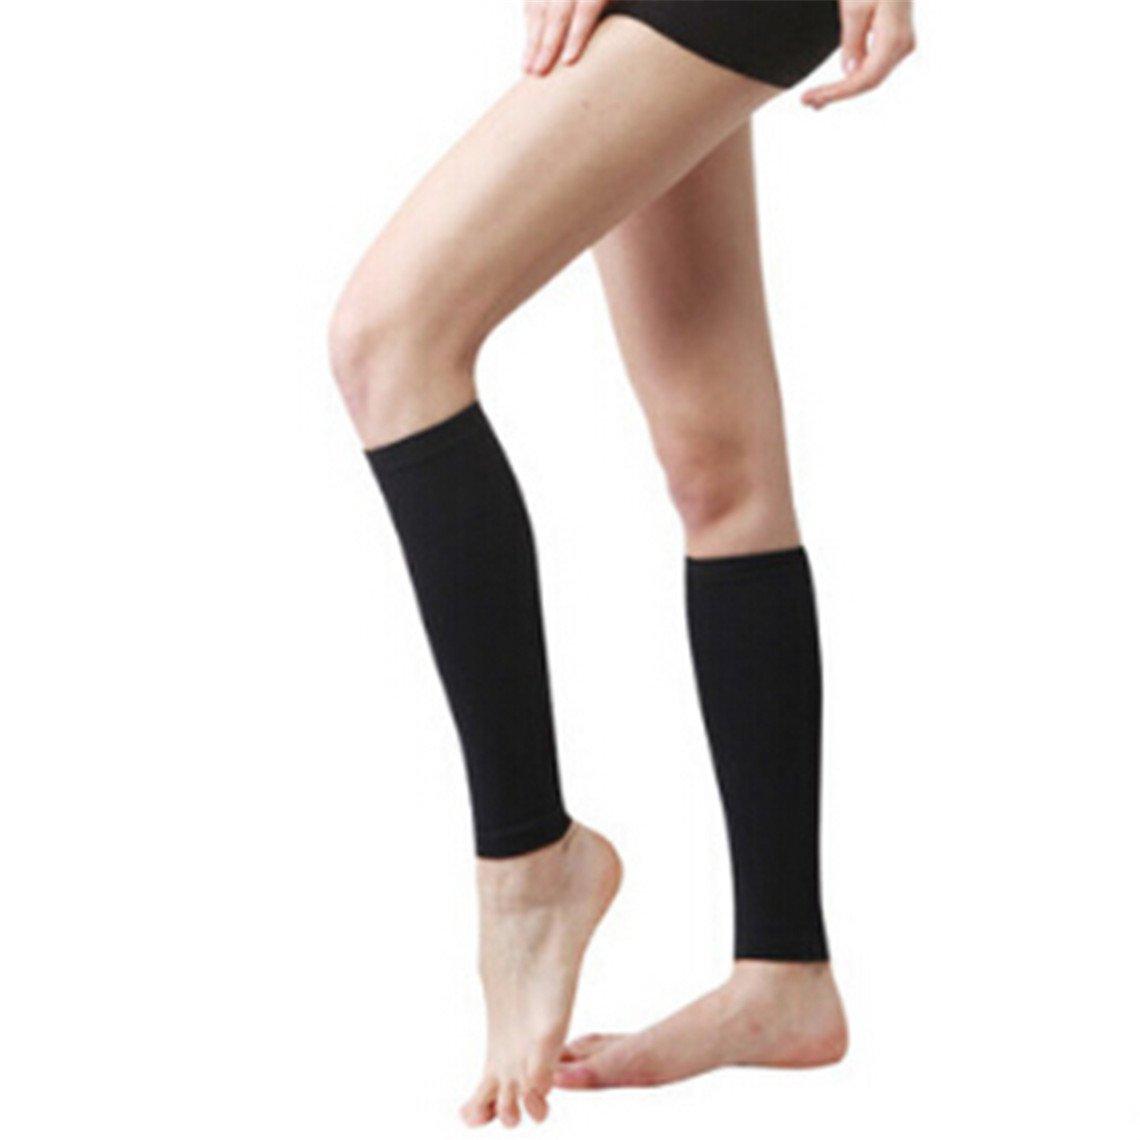 Rurah Leg Sleeves Support Protector Thigh Calf Warmer Socks Pads Legging Stockings for Women Men for Enhanced Circulation, Recovery, Running,black